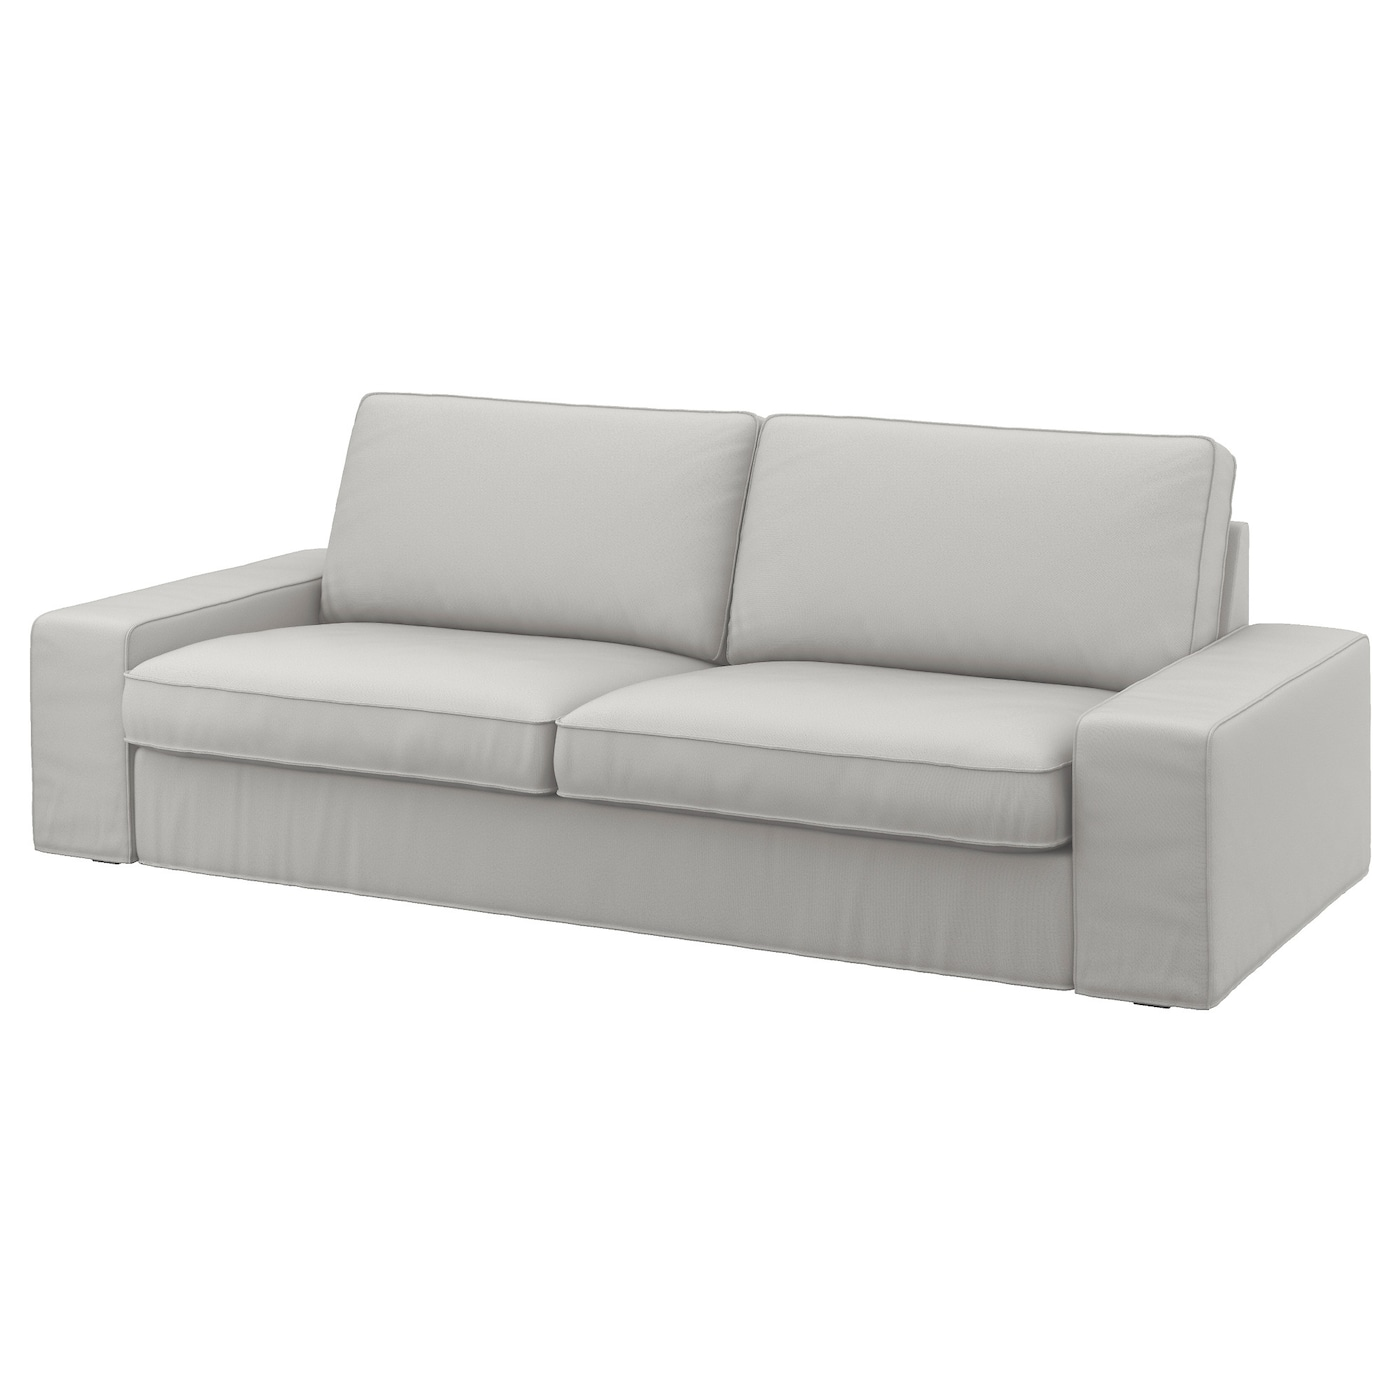 kivik cover three seat sofa ramna light grey ikea. Black Bedroom Furniture Sets. Home Design Ideas